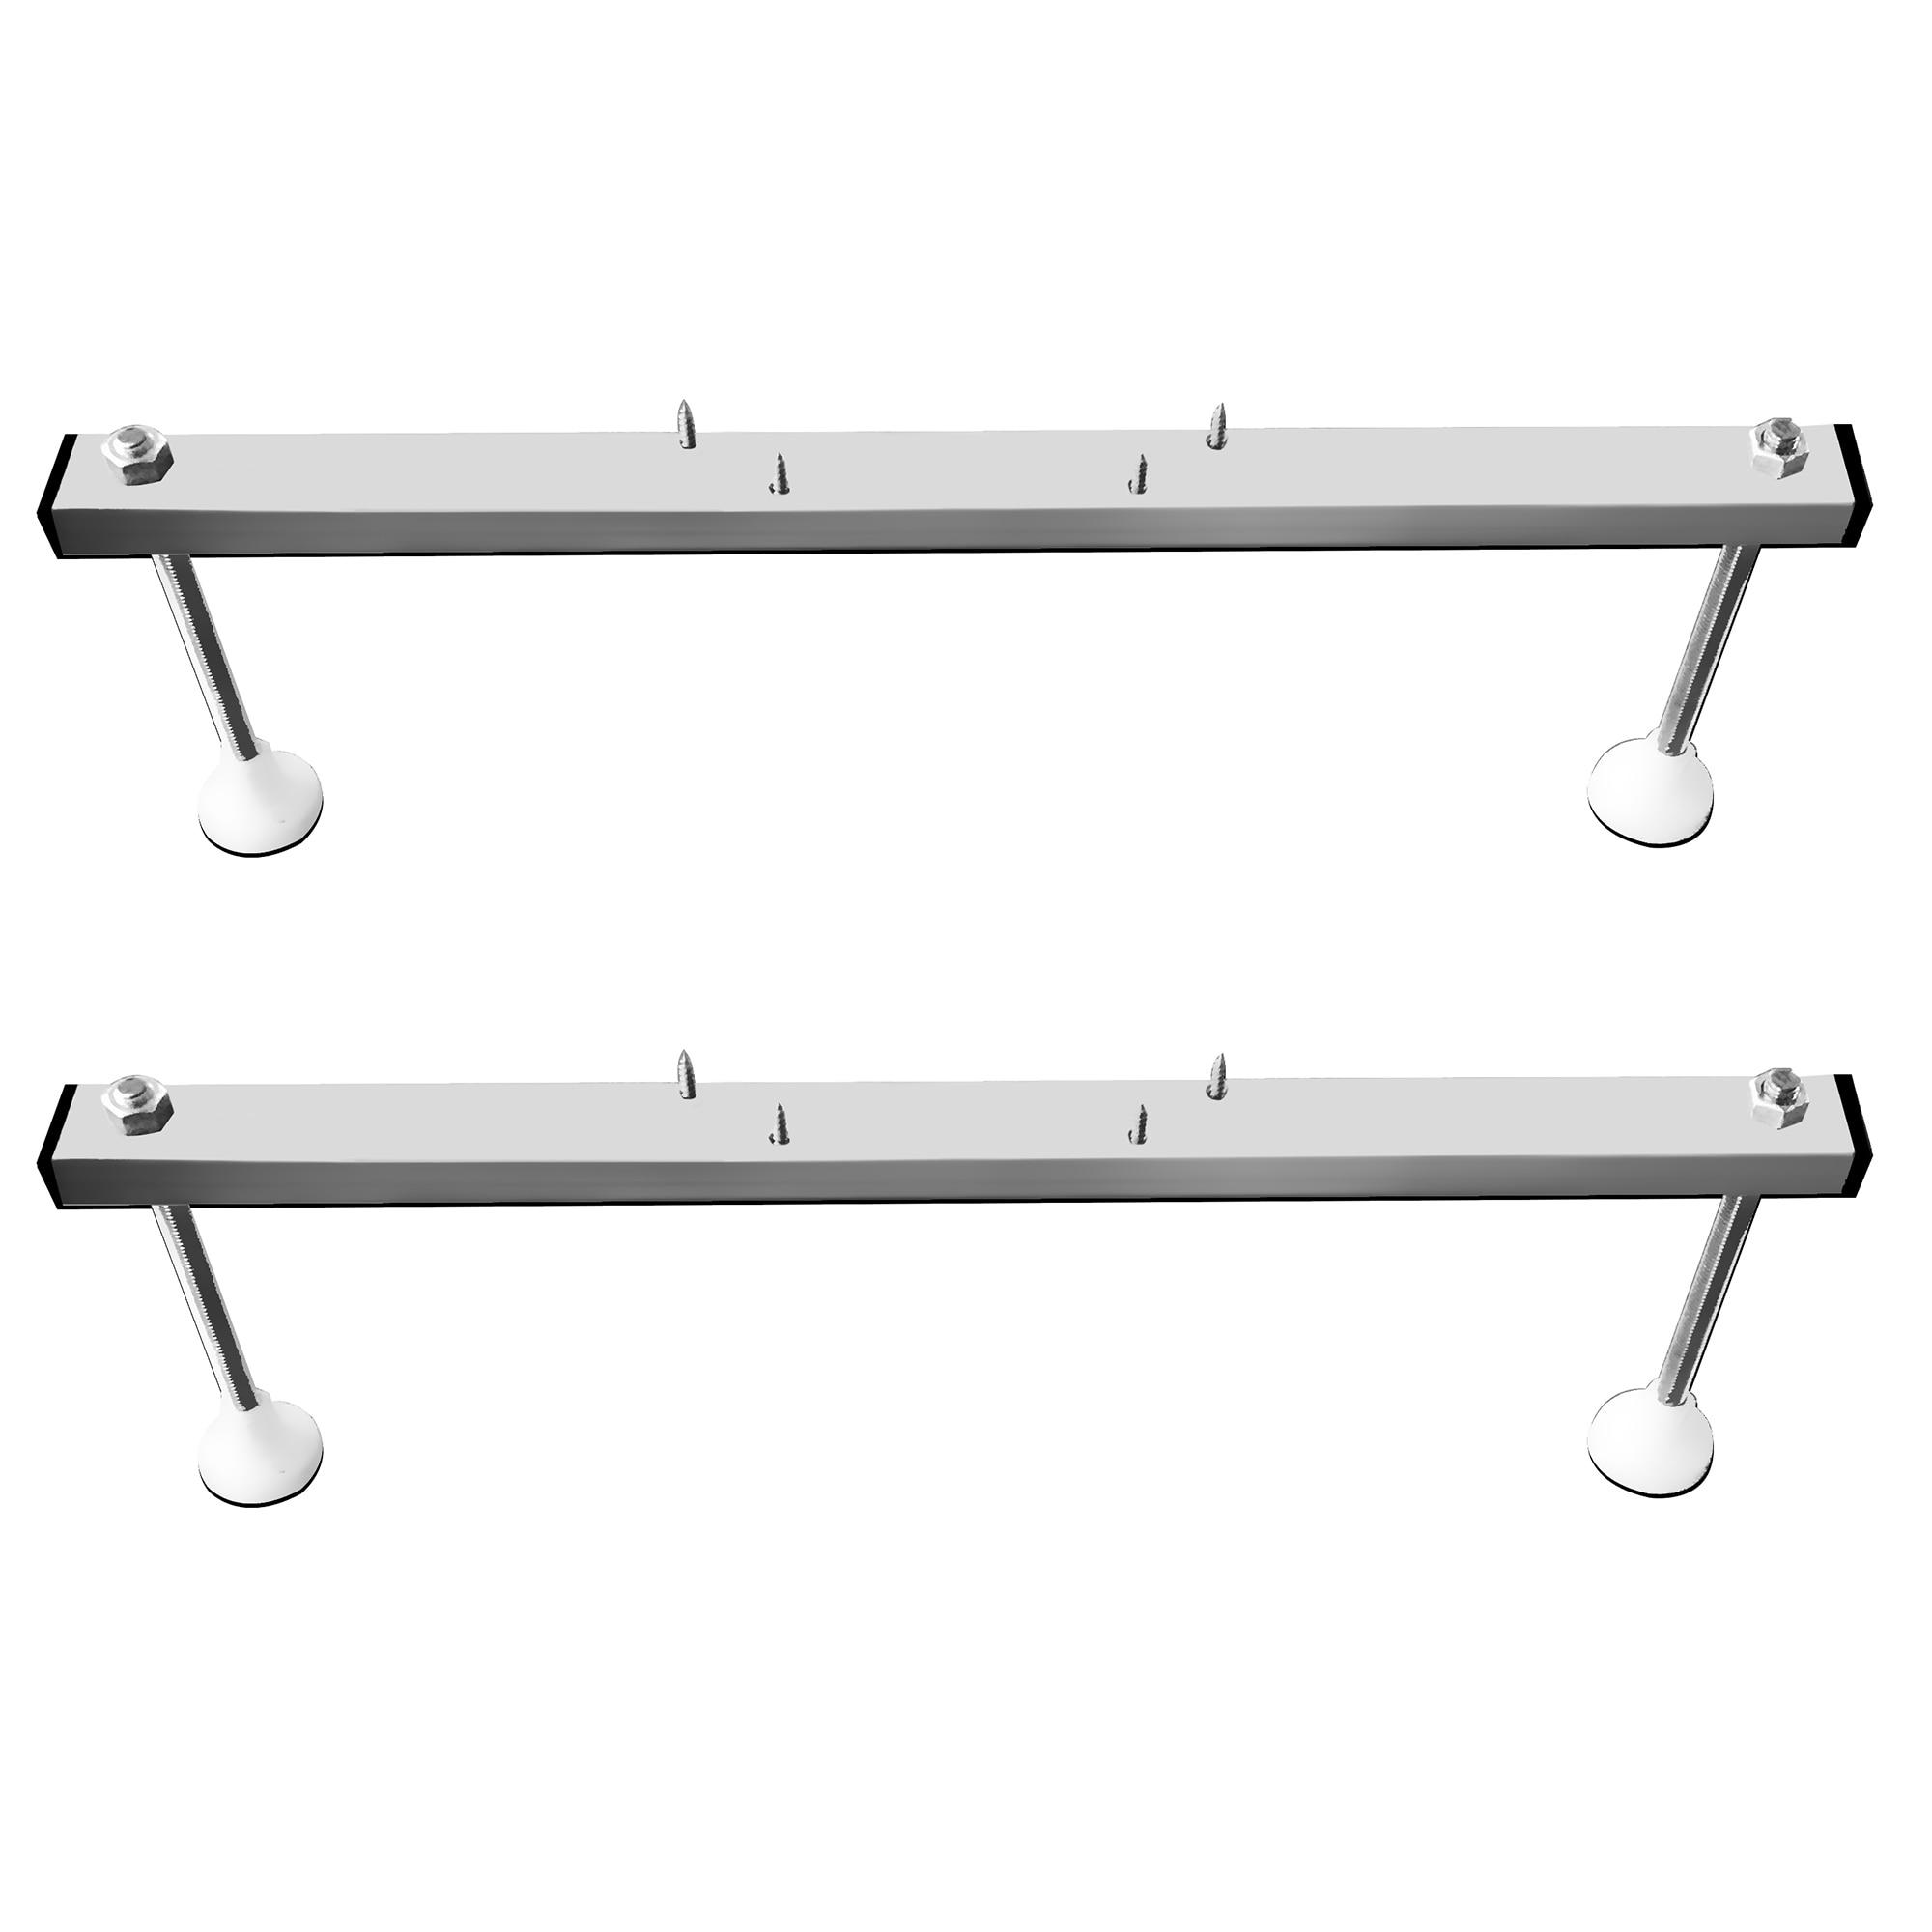 Fotografie Suport metalic Kring Smart 1, pentru cazi rectangulare cu lungime 120-180cm si latime maxim 80cm